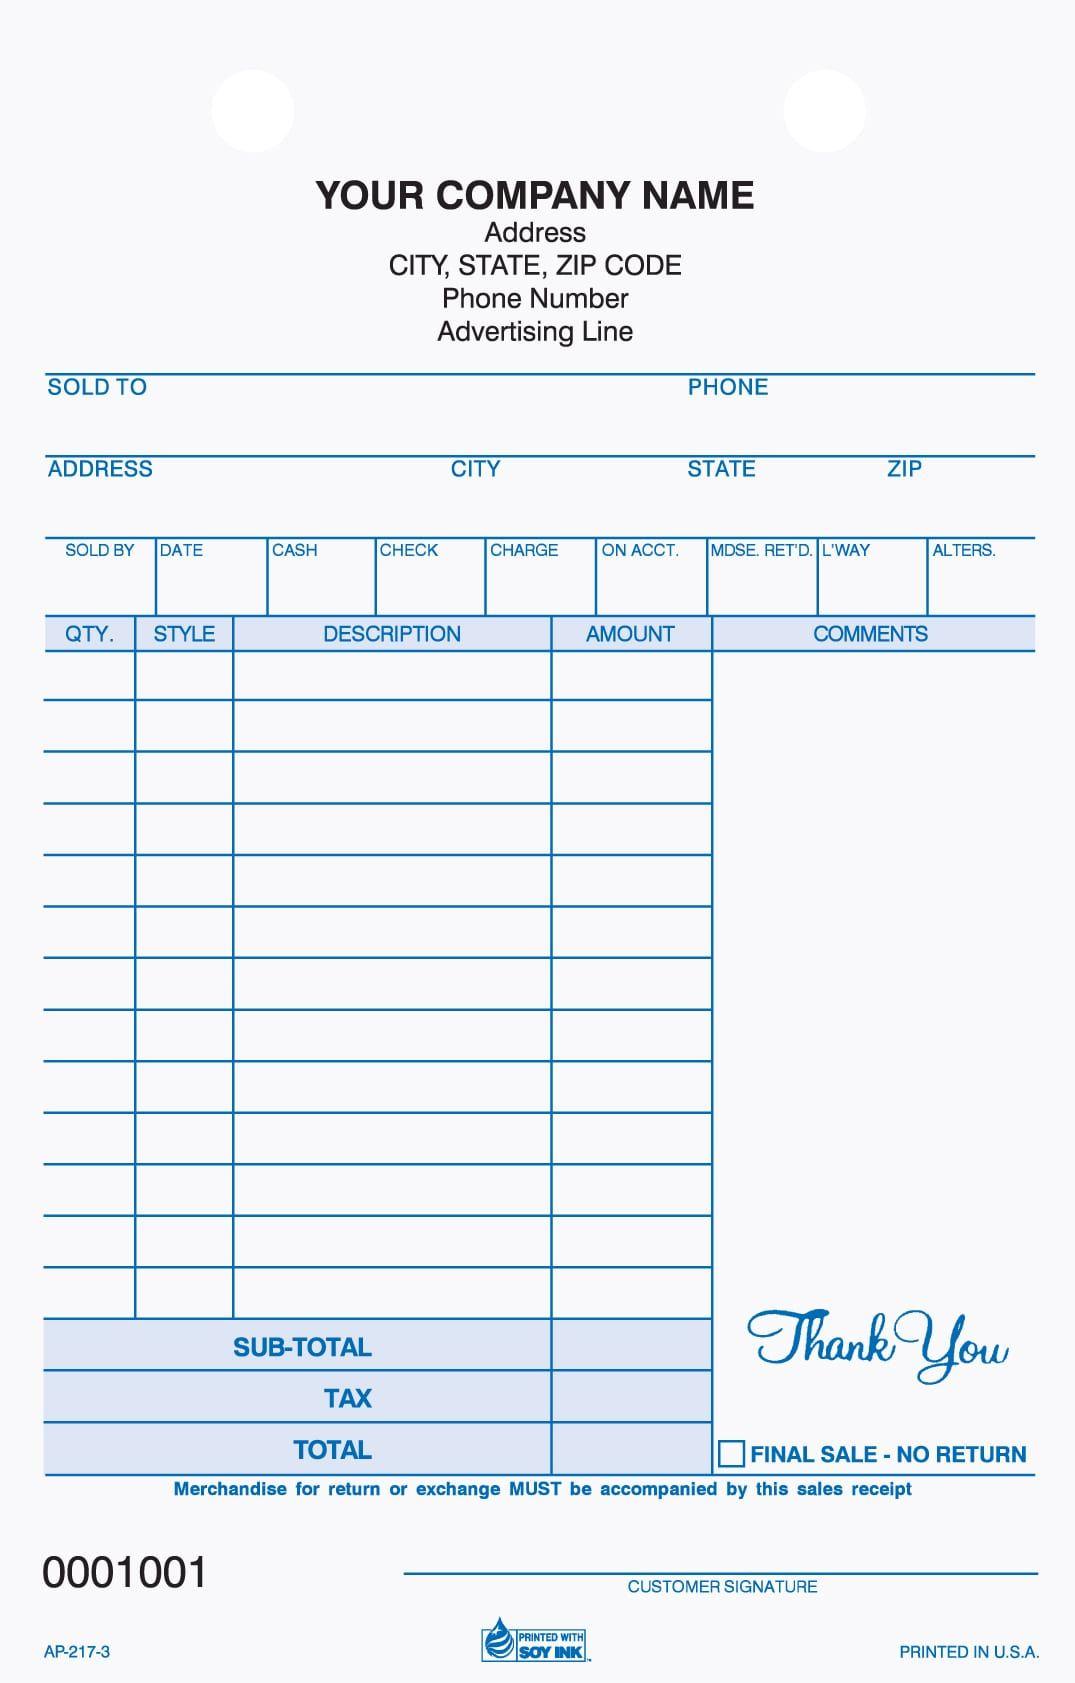 036 81 49 Ndash 036 344 052 Part Apparel Register Formshttps Www Stargatedesign Com Product 2 Invoice Template Word Paper Art Diy Free Receipt Template